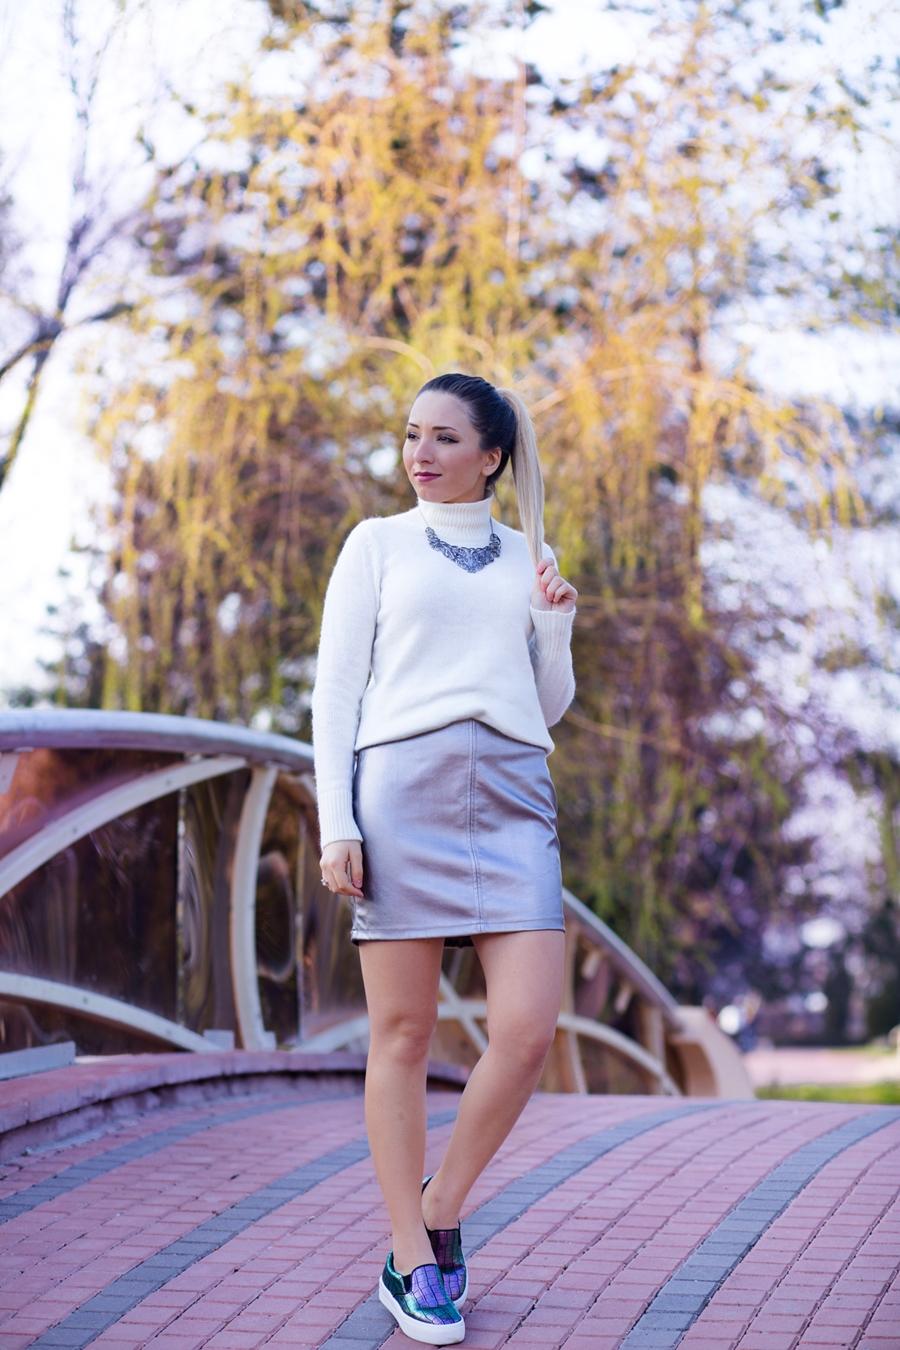 Street style - white turtleneck white sweater, metallic silver skirt, chameleon sport shoes - spring outfit